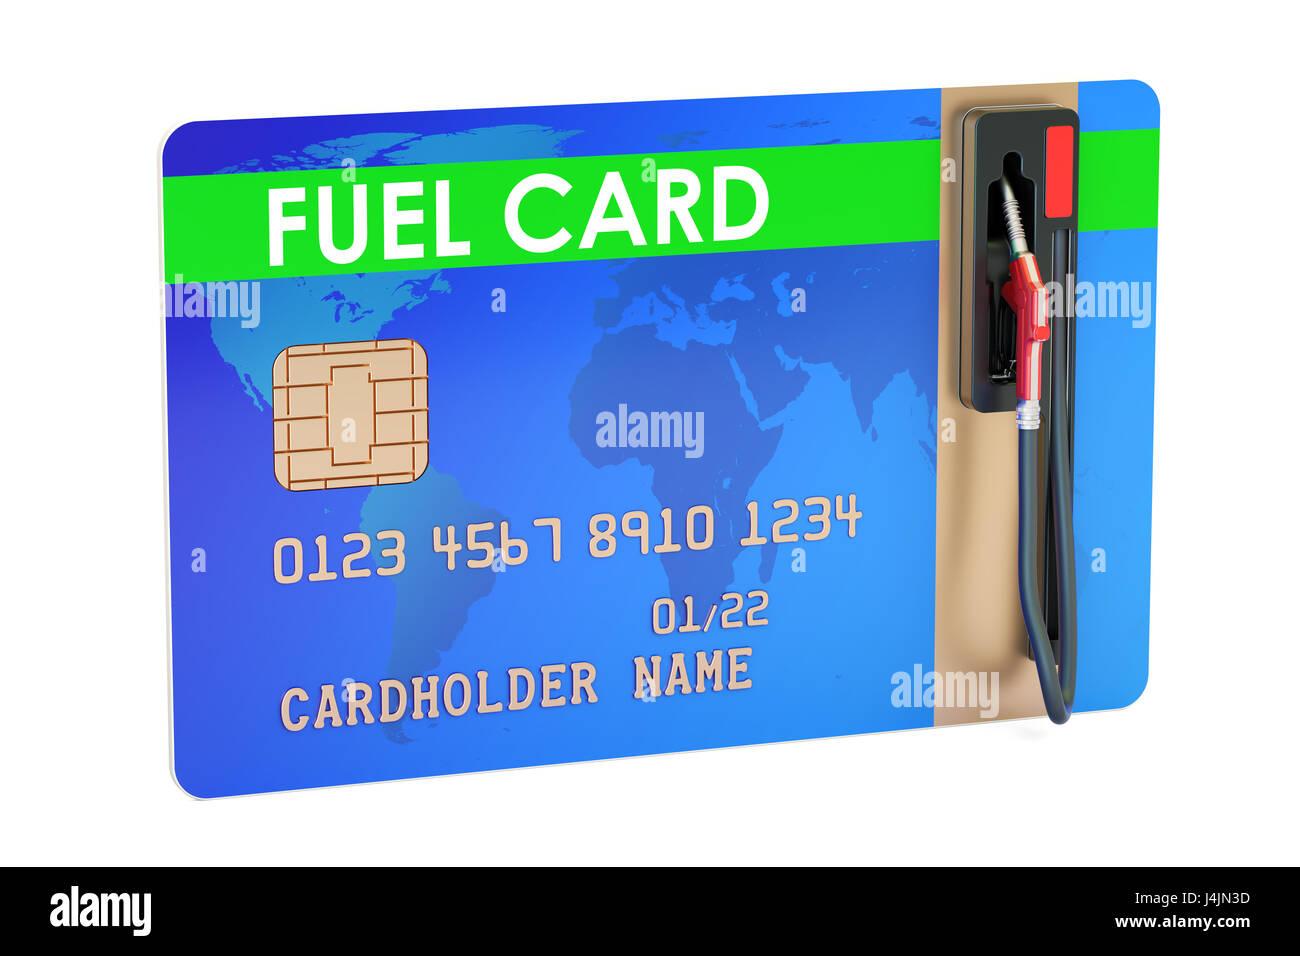 Fuel Card Stock Photos & Fuel Card Stock Images - Alamy